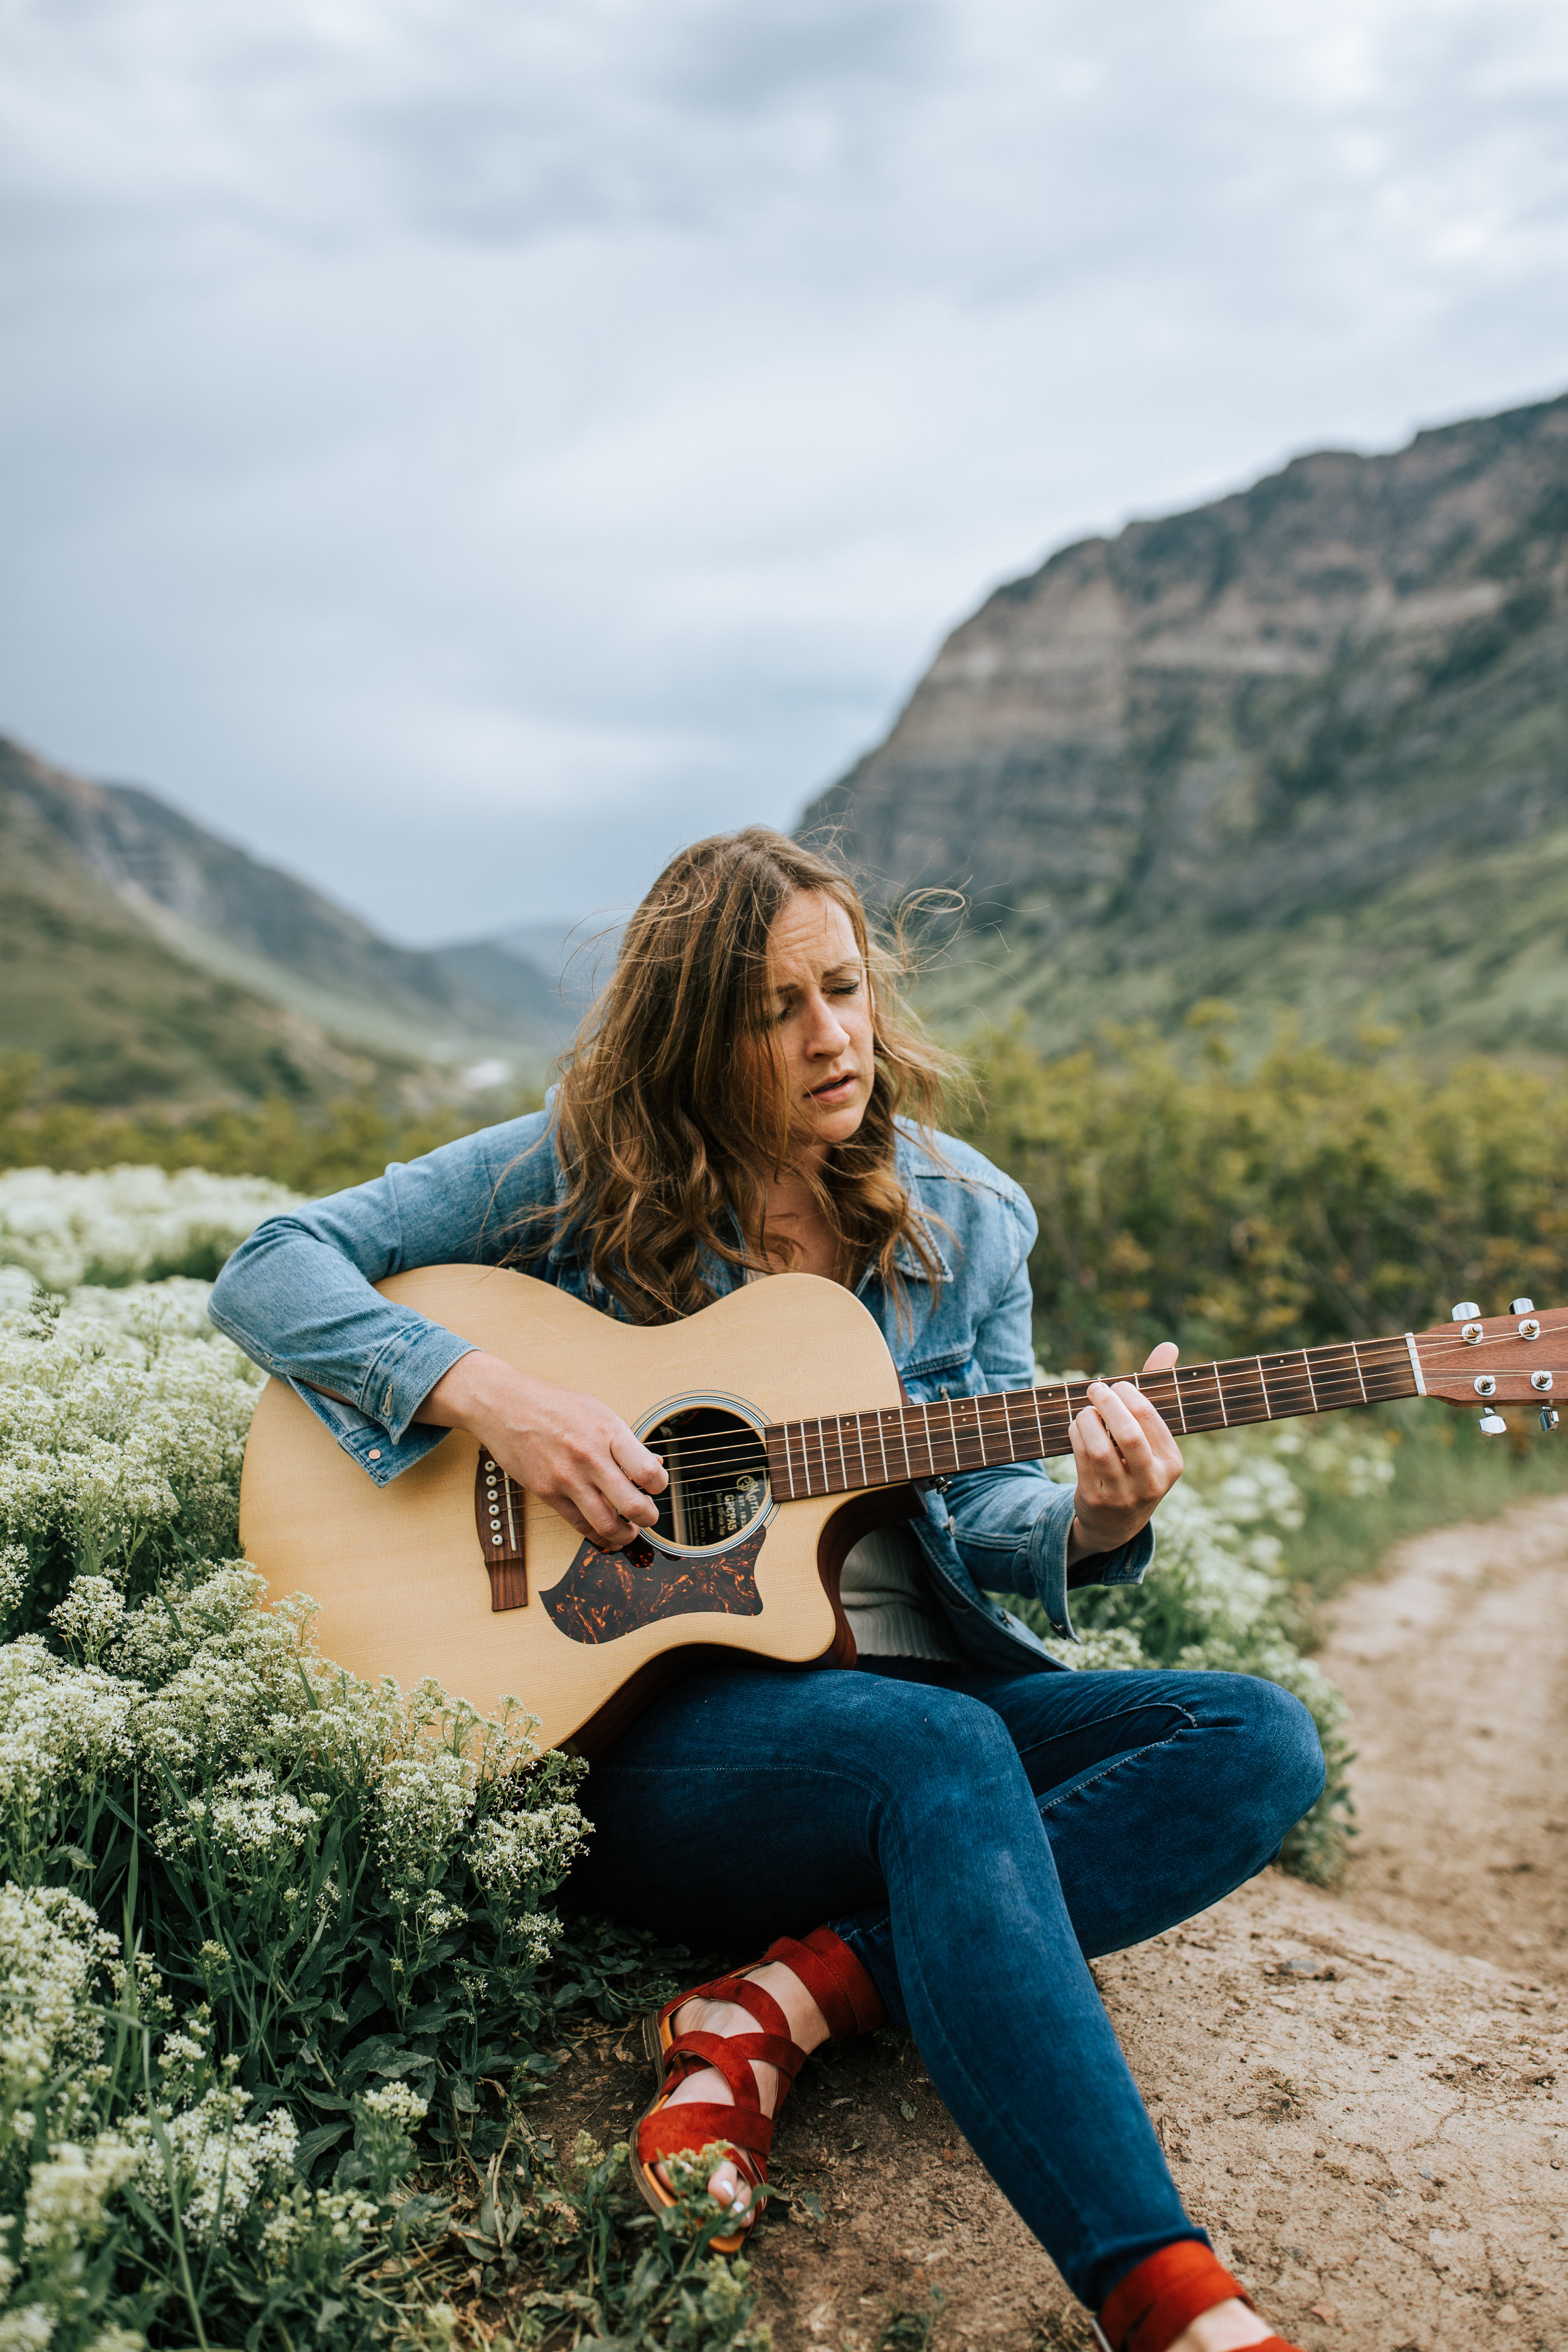 Windy mountain wildflower portraits guitar